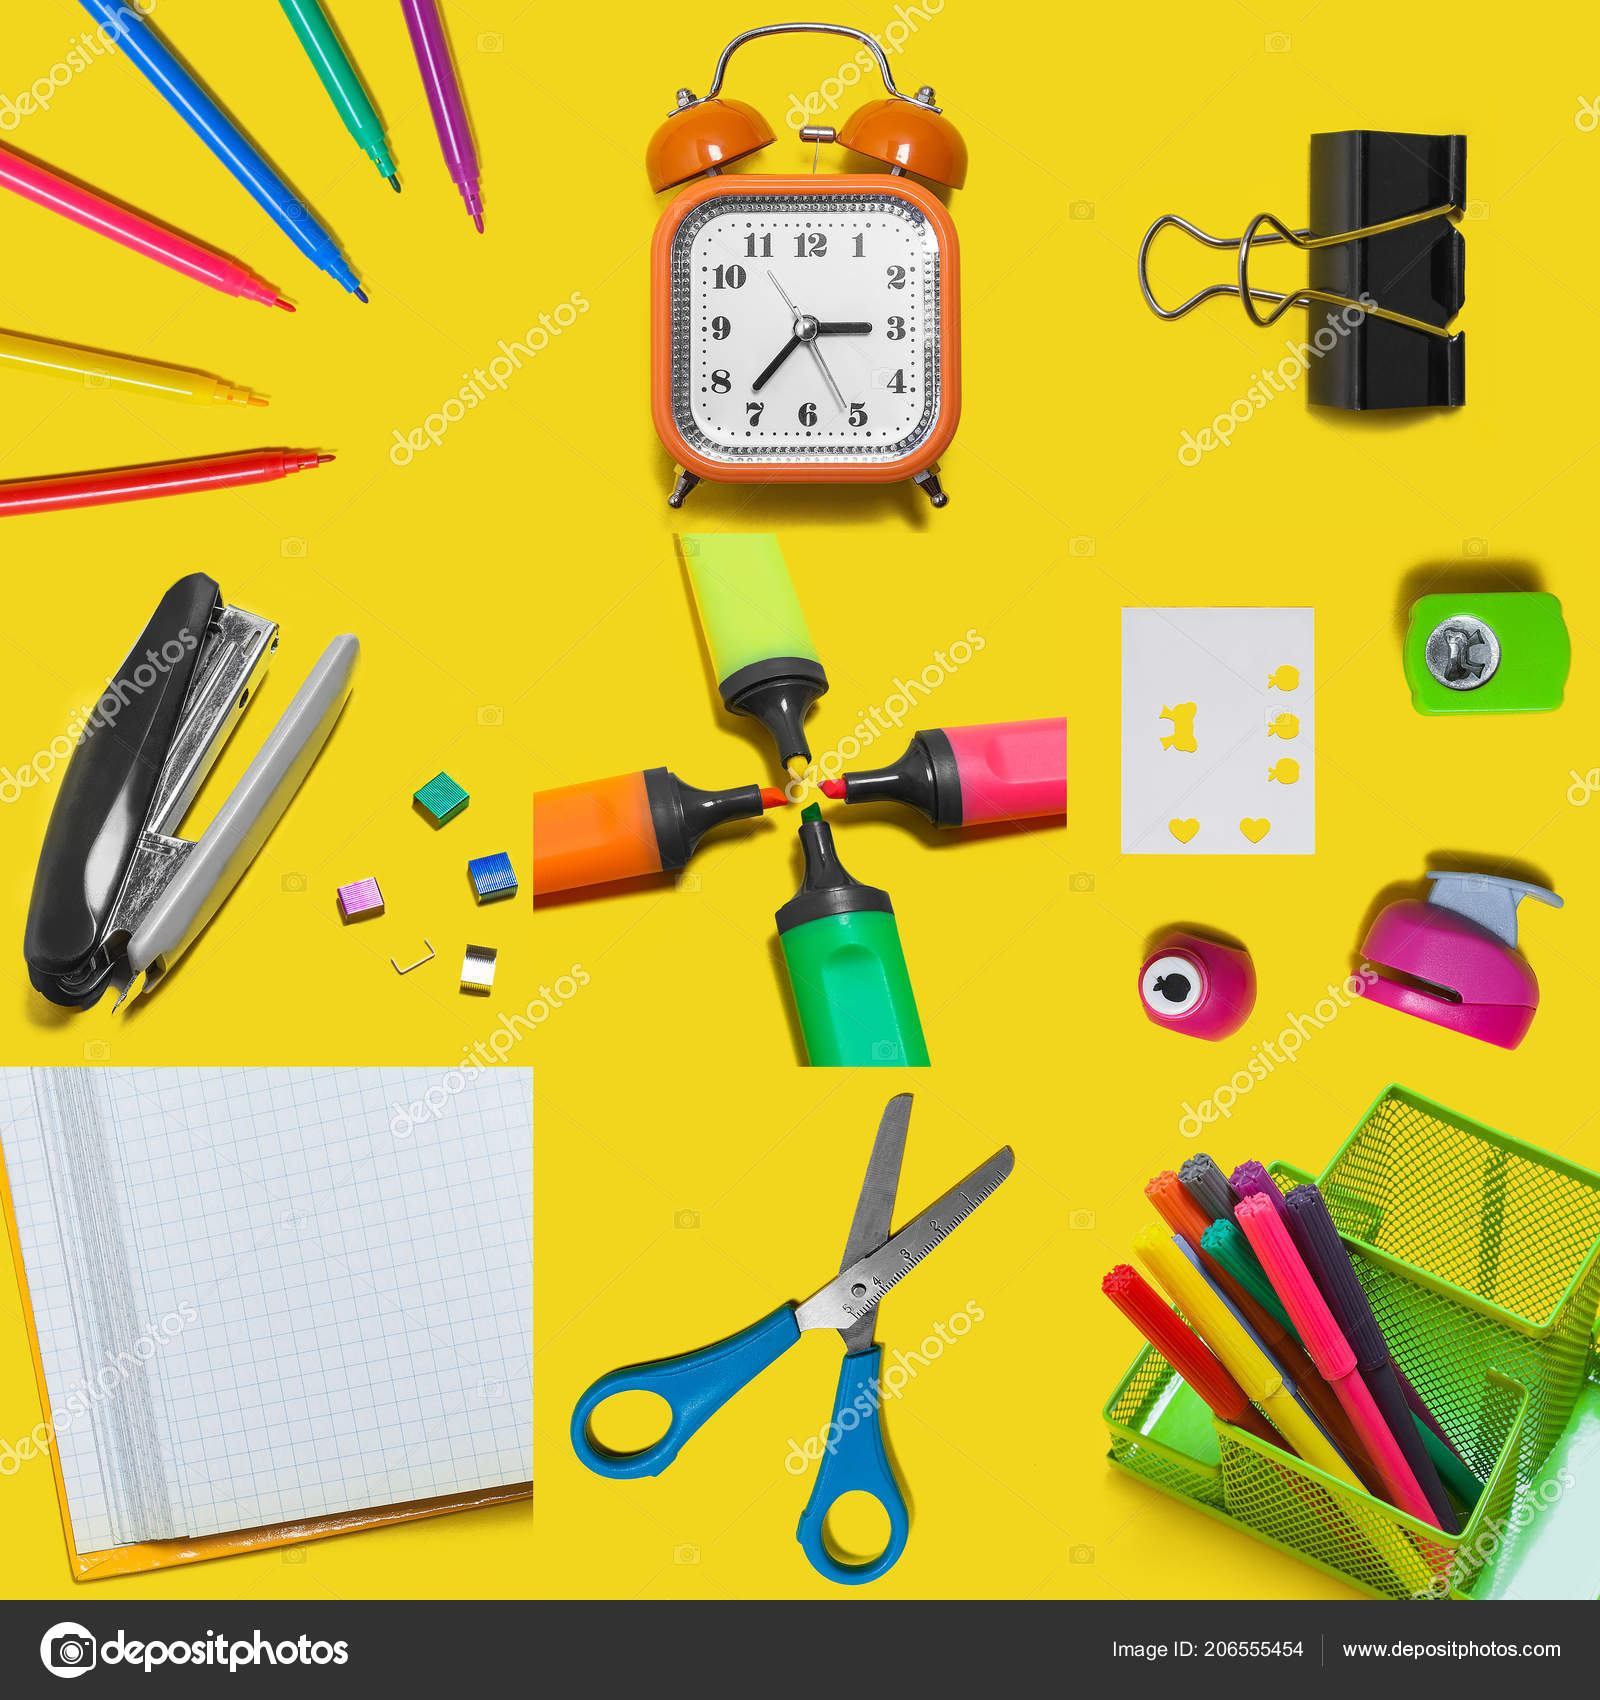 24d1721f786 Πίσω Στο Σχολείο Σχεδίου Σχολικά Είδη Και Στοιχεία Κίτρινο Φόντο —  Φωτογραφία Αρχείου